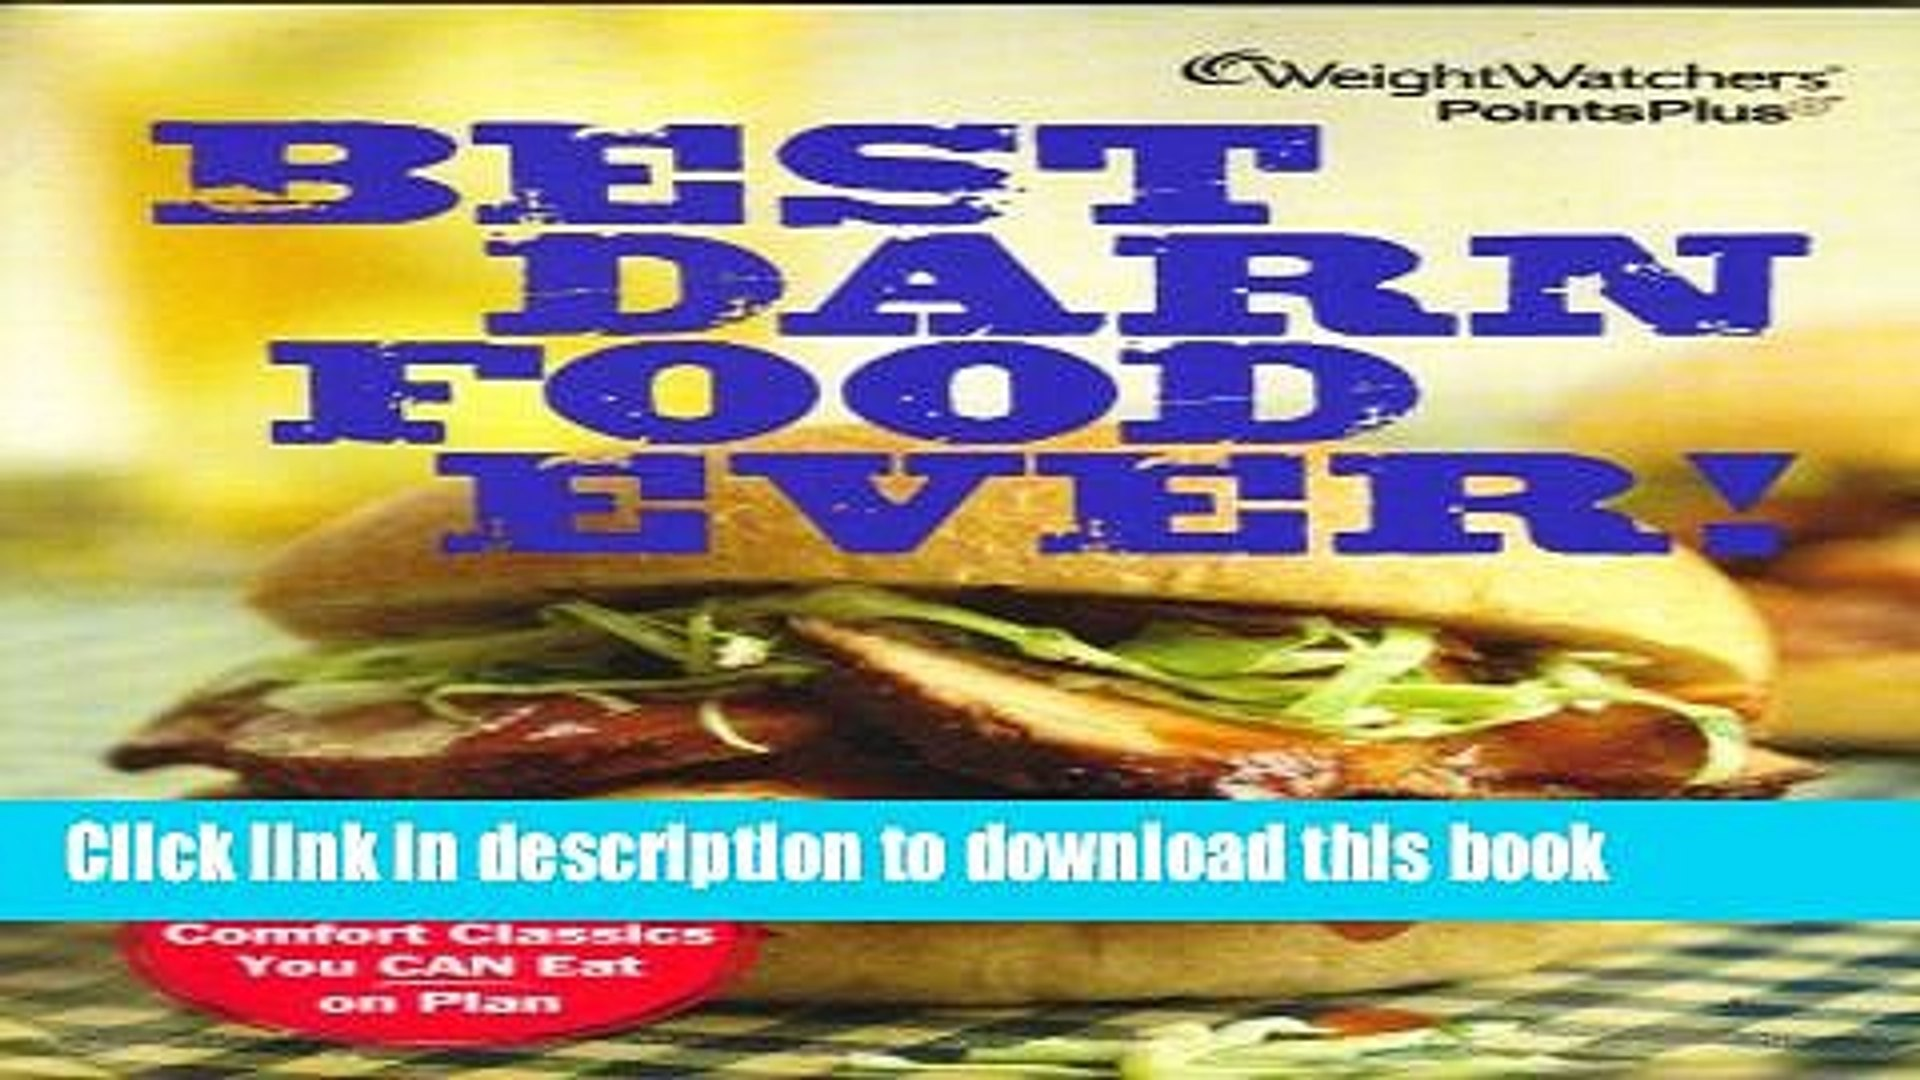 PDF  Weight Watchers PointsPlus Best Darn Food Ever Cookbook (140 Comfort Classics)  Free Books